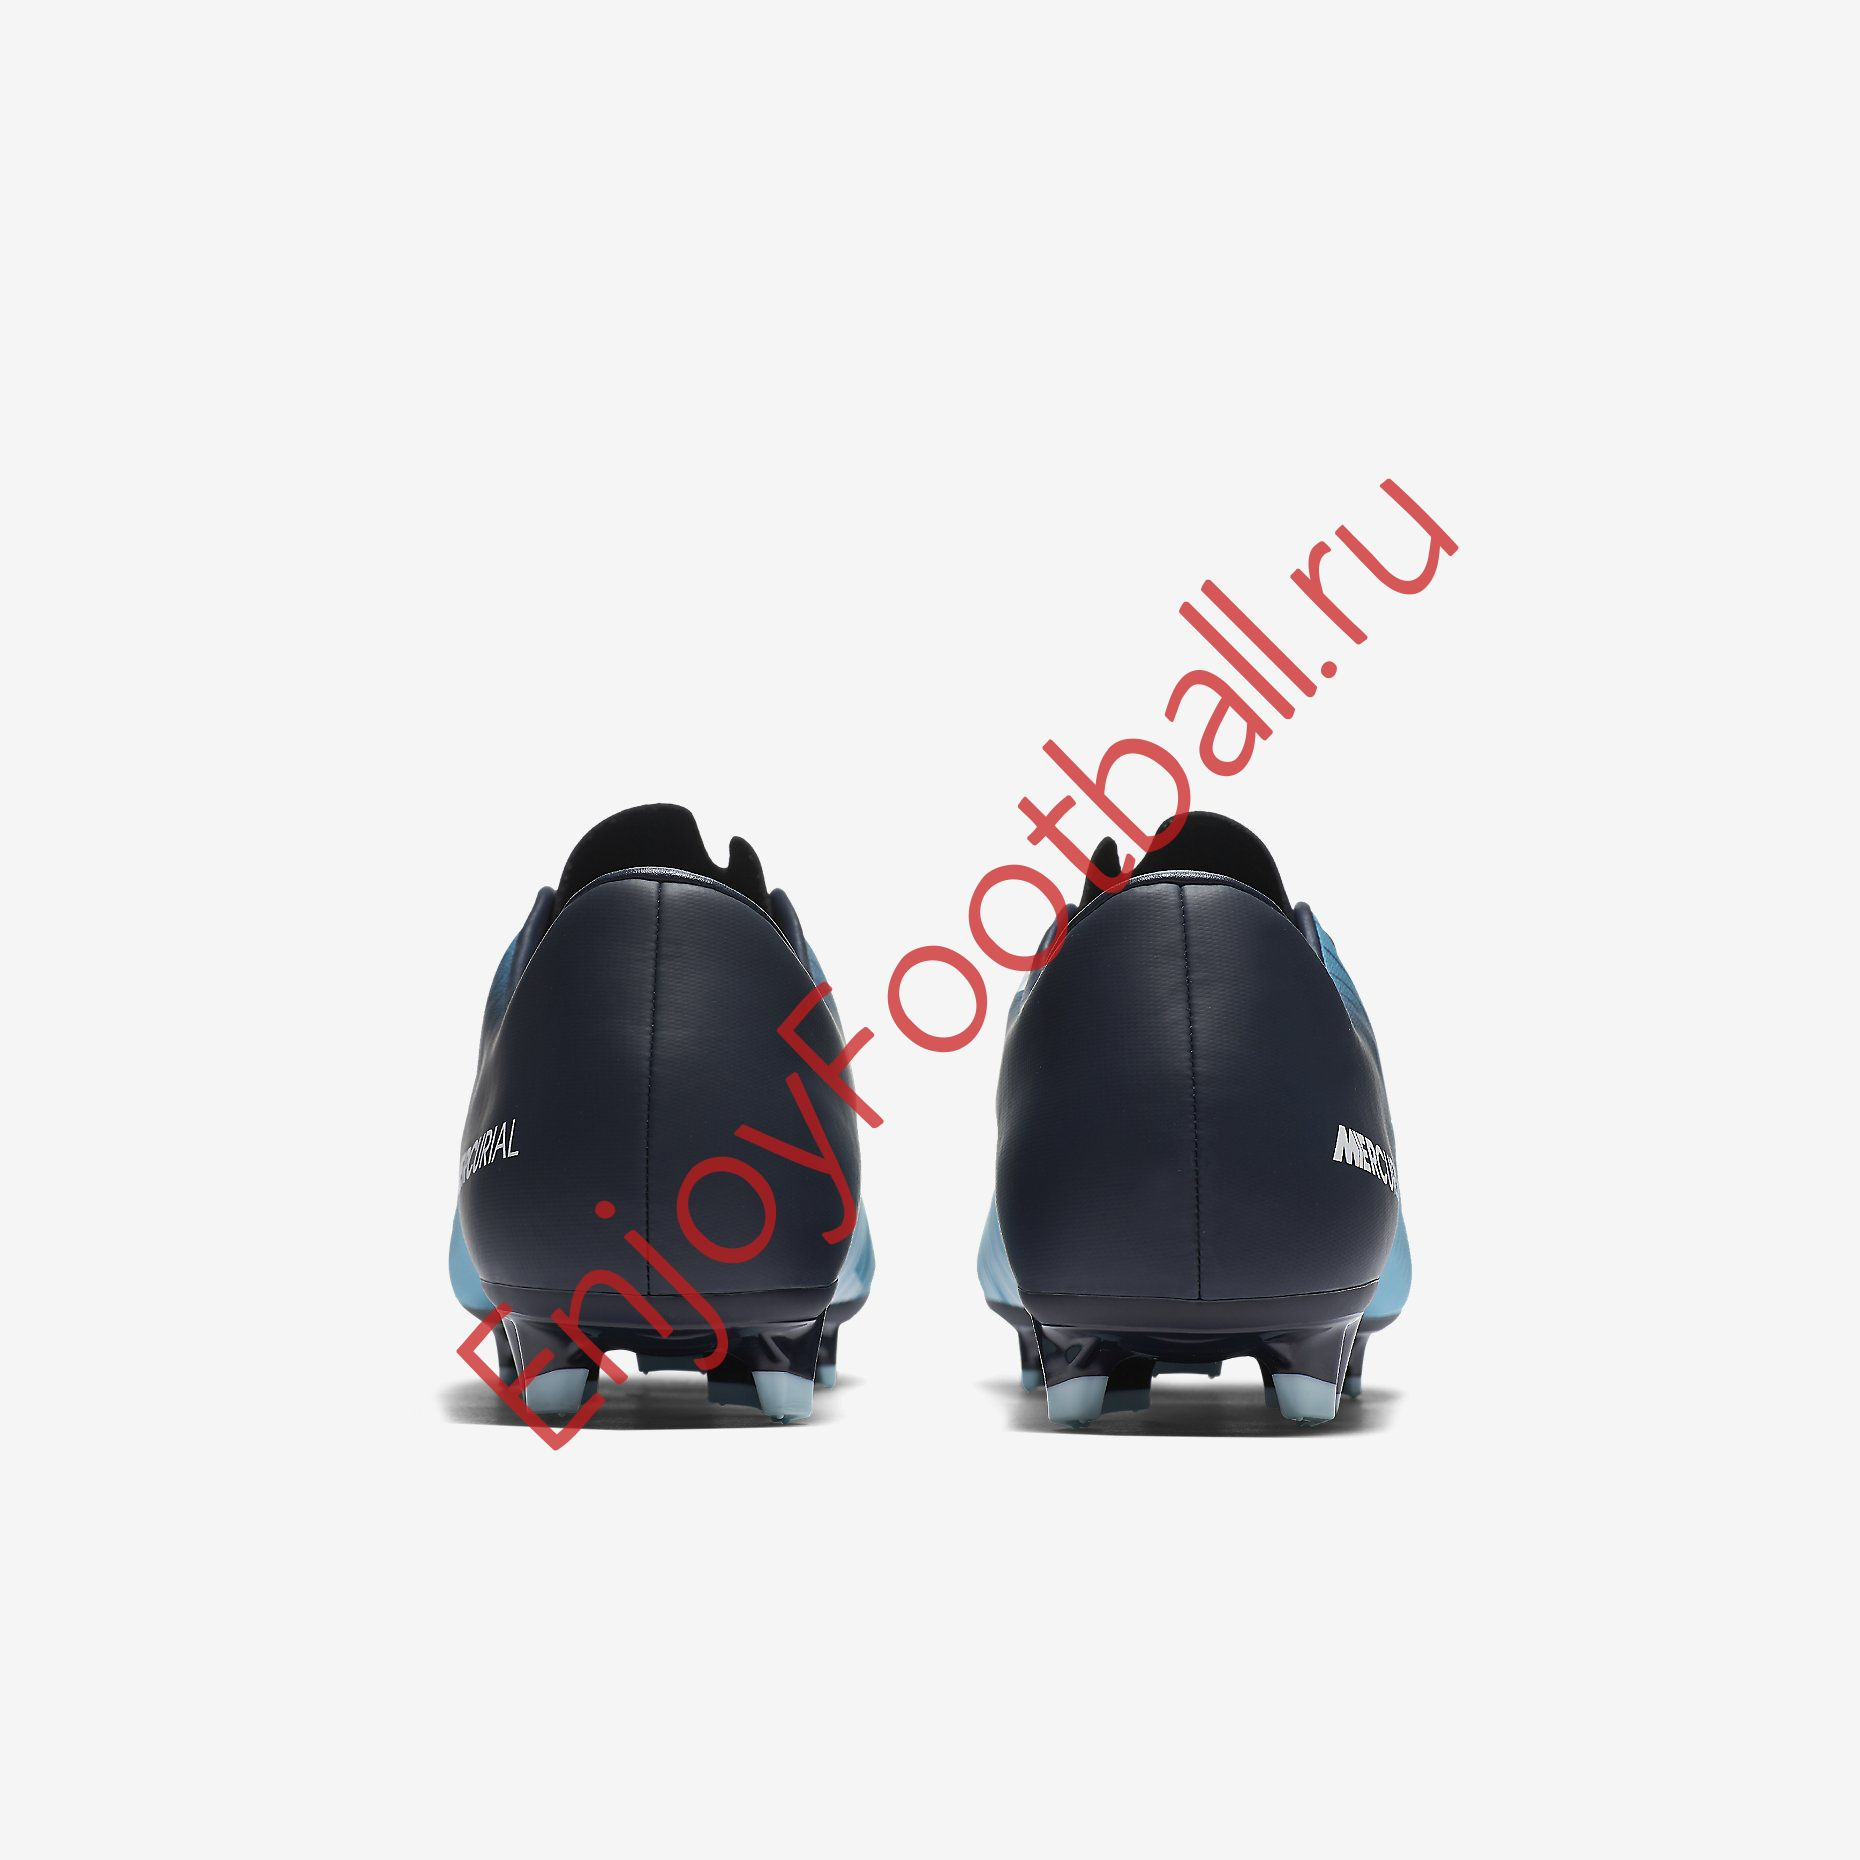 16a66b330125 Бутсы NIKE MERCURIAL VICTORY VI FG 831964-404 купить в интернет ...